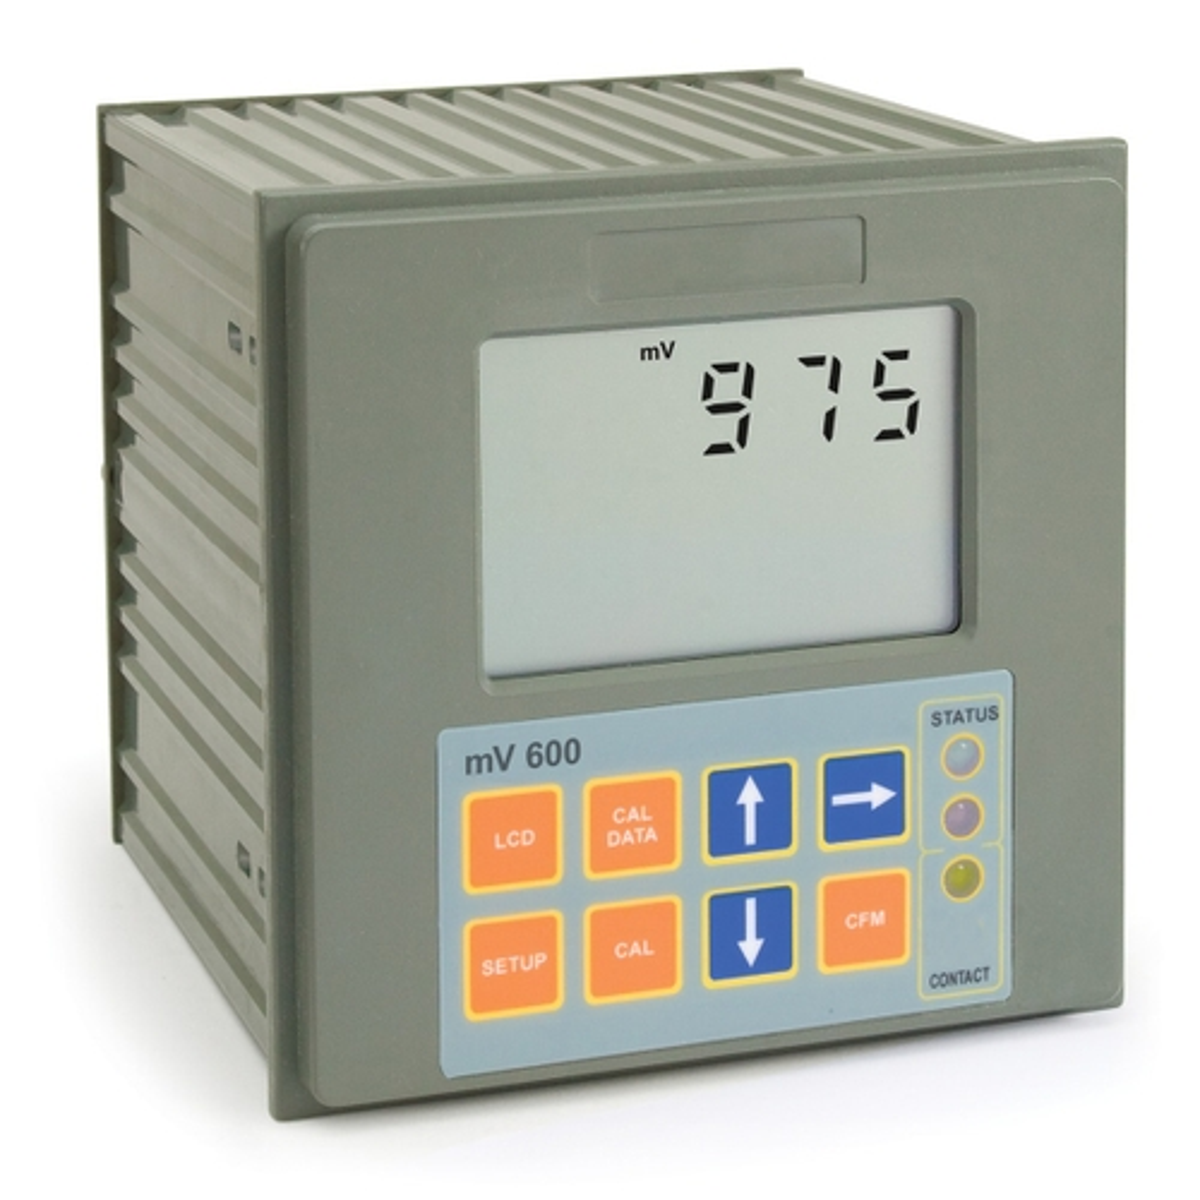 mV600 Panel-mounted ORP Digital Controller